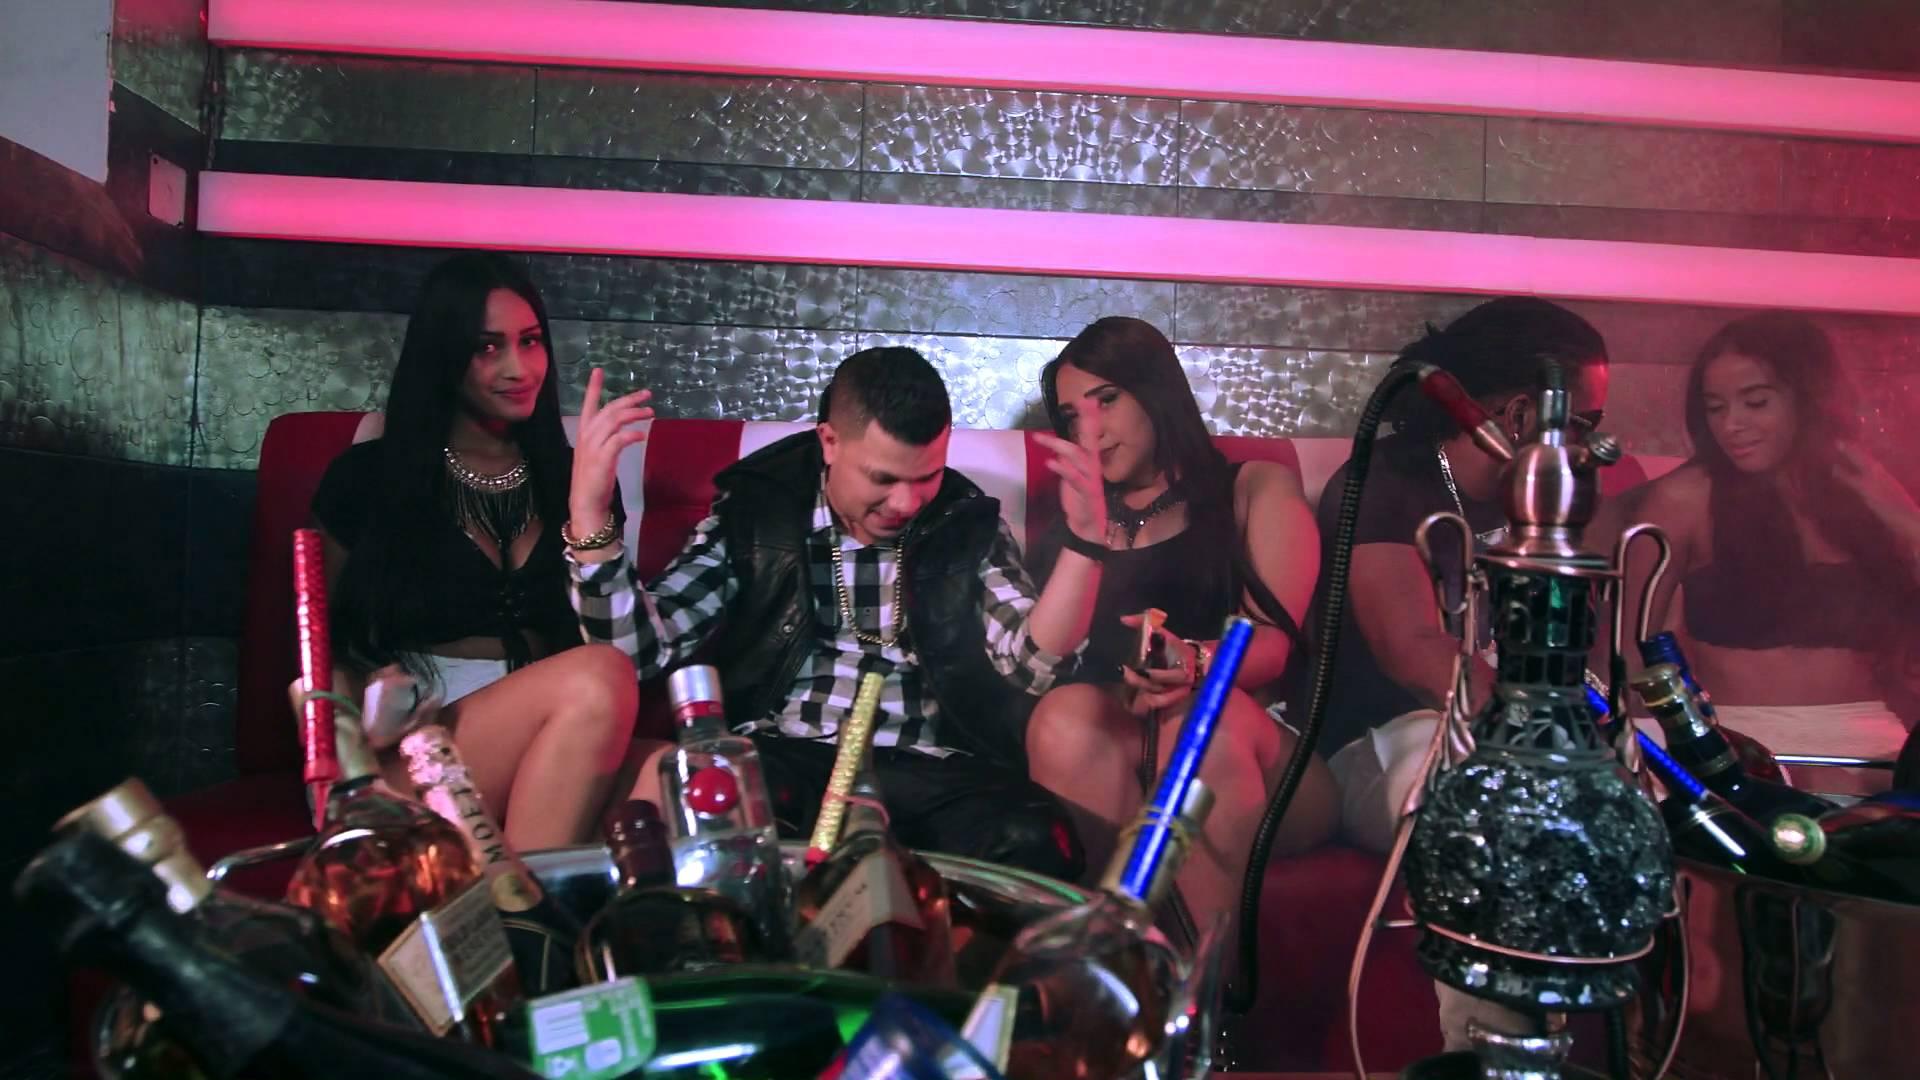 Clasifica2 Ft Jowell & Randy – Yo Tengo Un Pana (Remix) (Video Trailer)